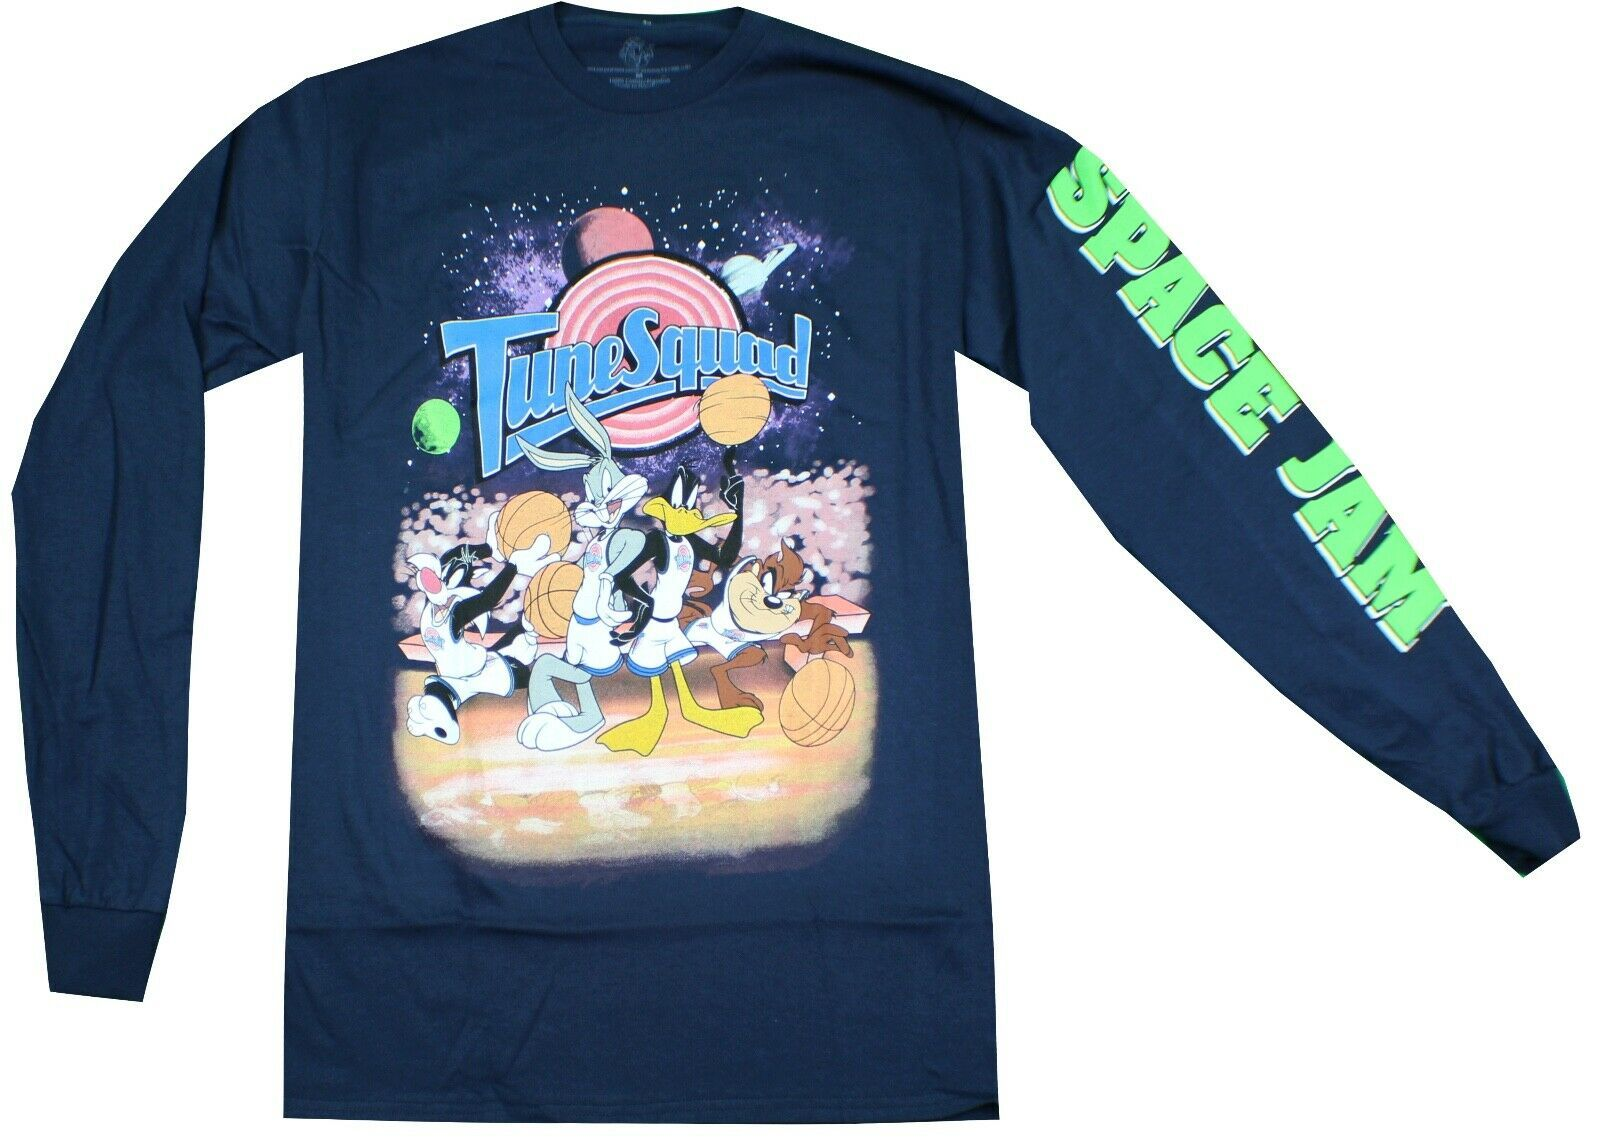 Loony Tunes Space Jam Tunes Squad Long Sleeve Shirt Navy Retro Movie Tee Mens Space T Shirt Ideas Of Long Sleeve Shirts Space Shirts Long Sleeve Tshirt Men